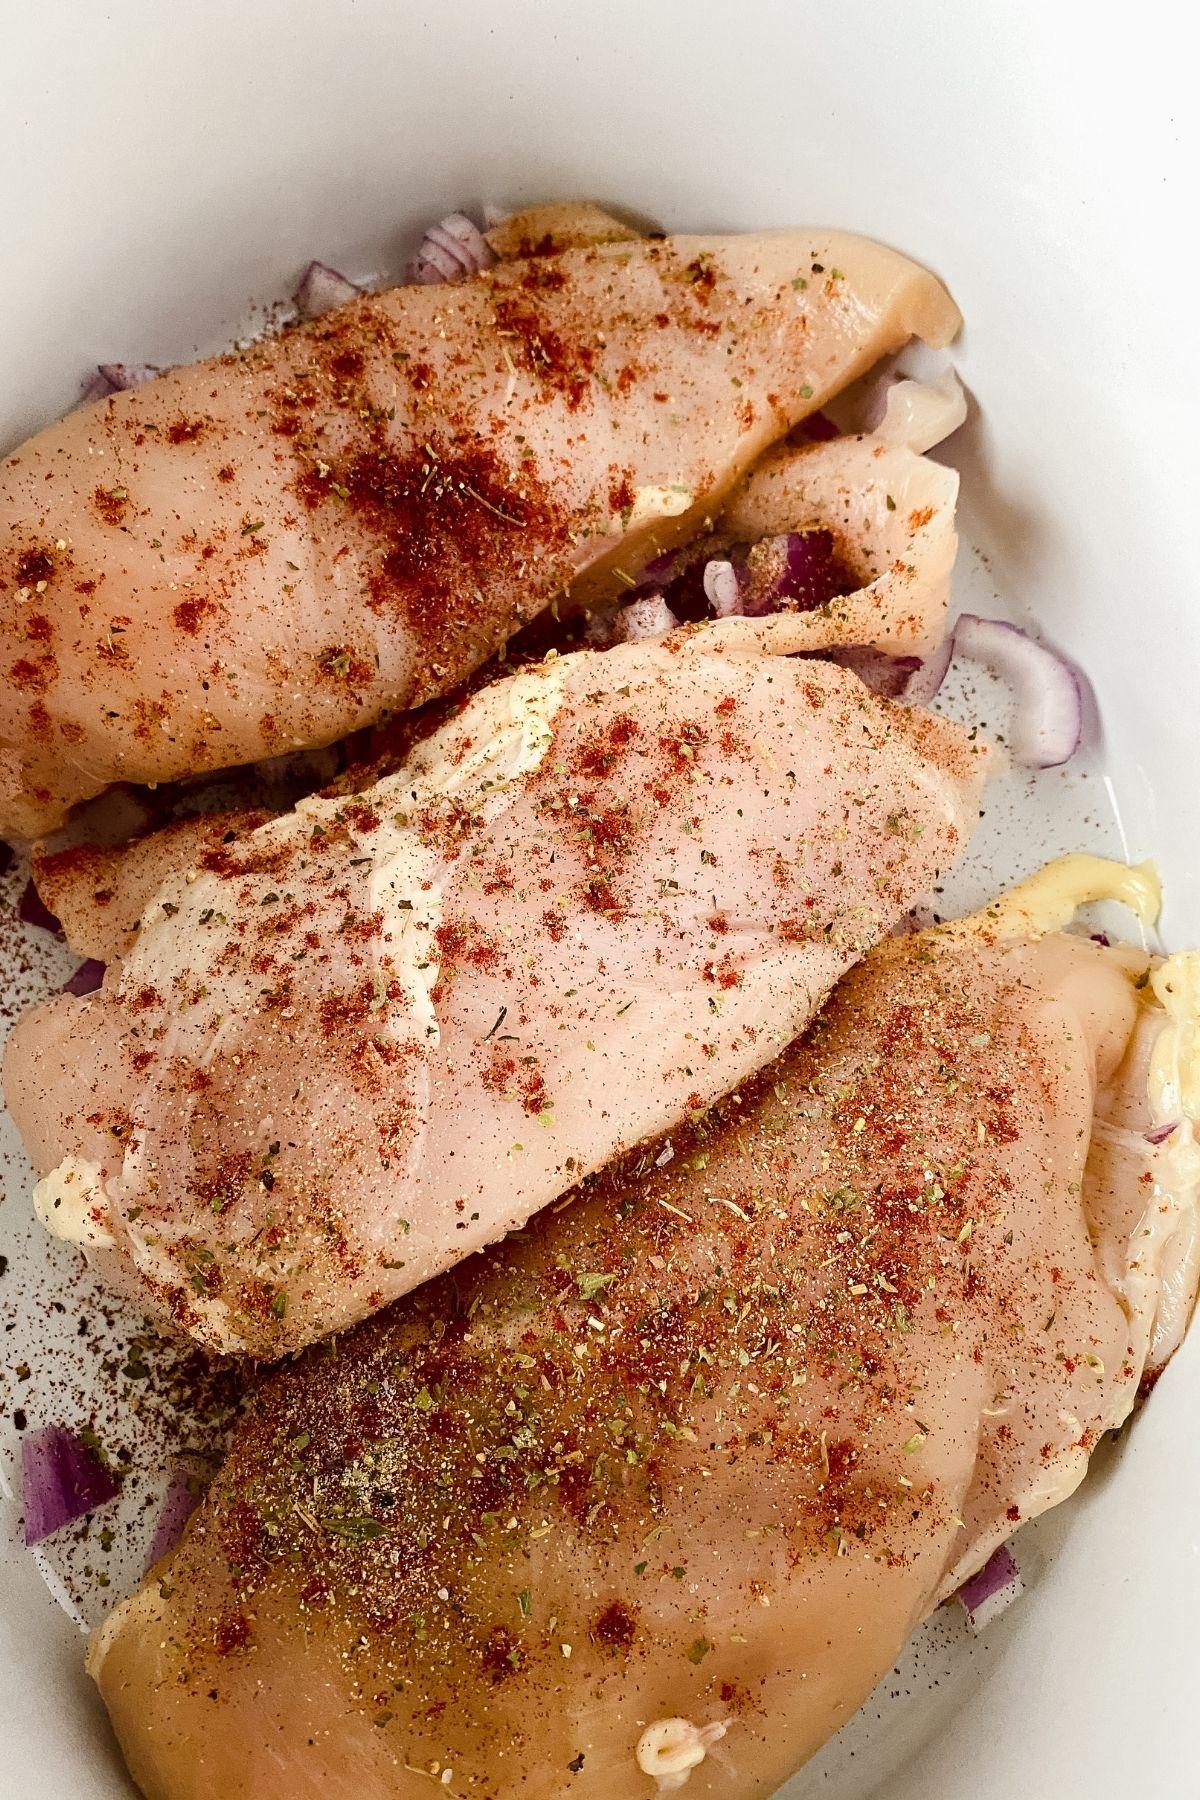 Seasoned chicken in a white slow cooker